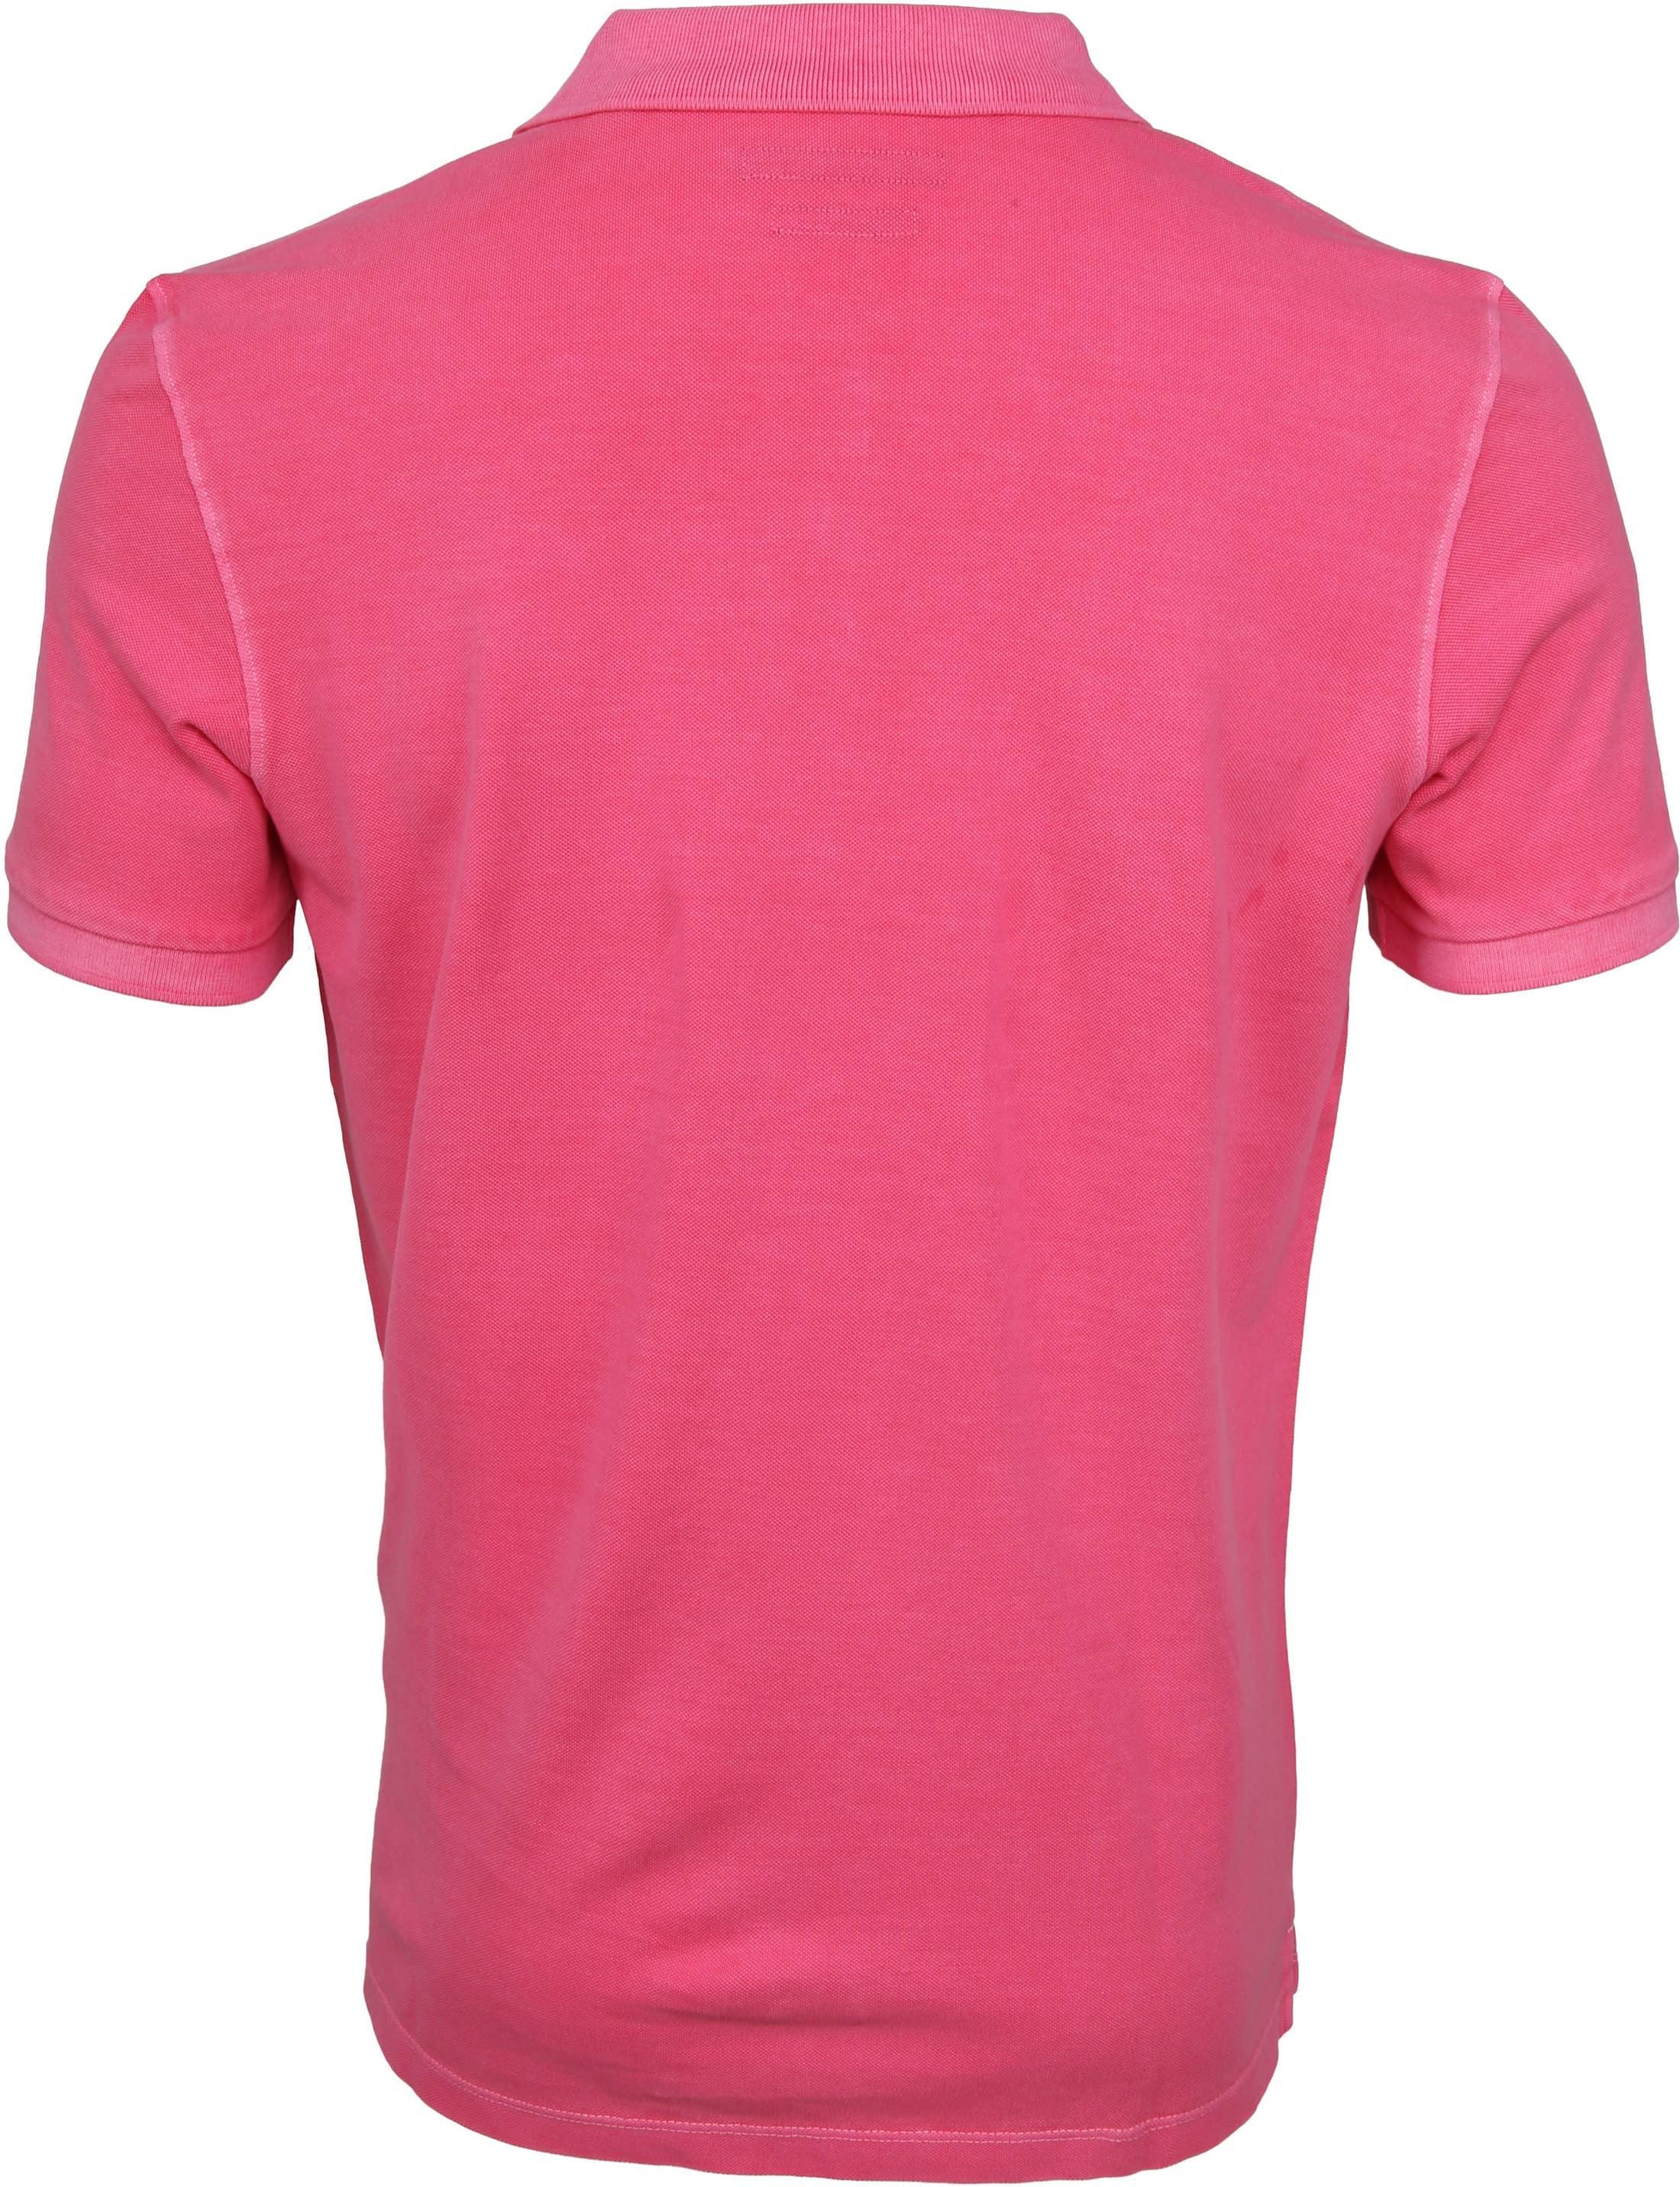 Marc O'Polo Poloshirt Garment Dyed Ibis Pink foto 3